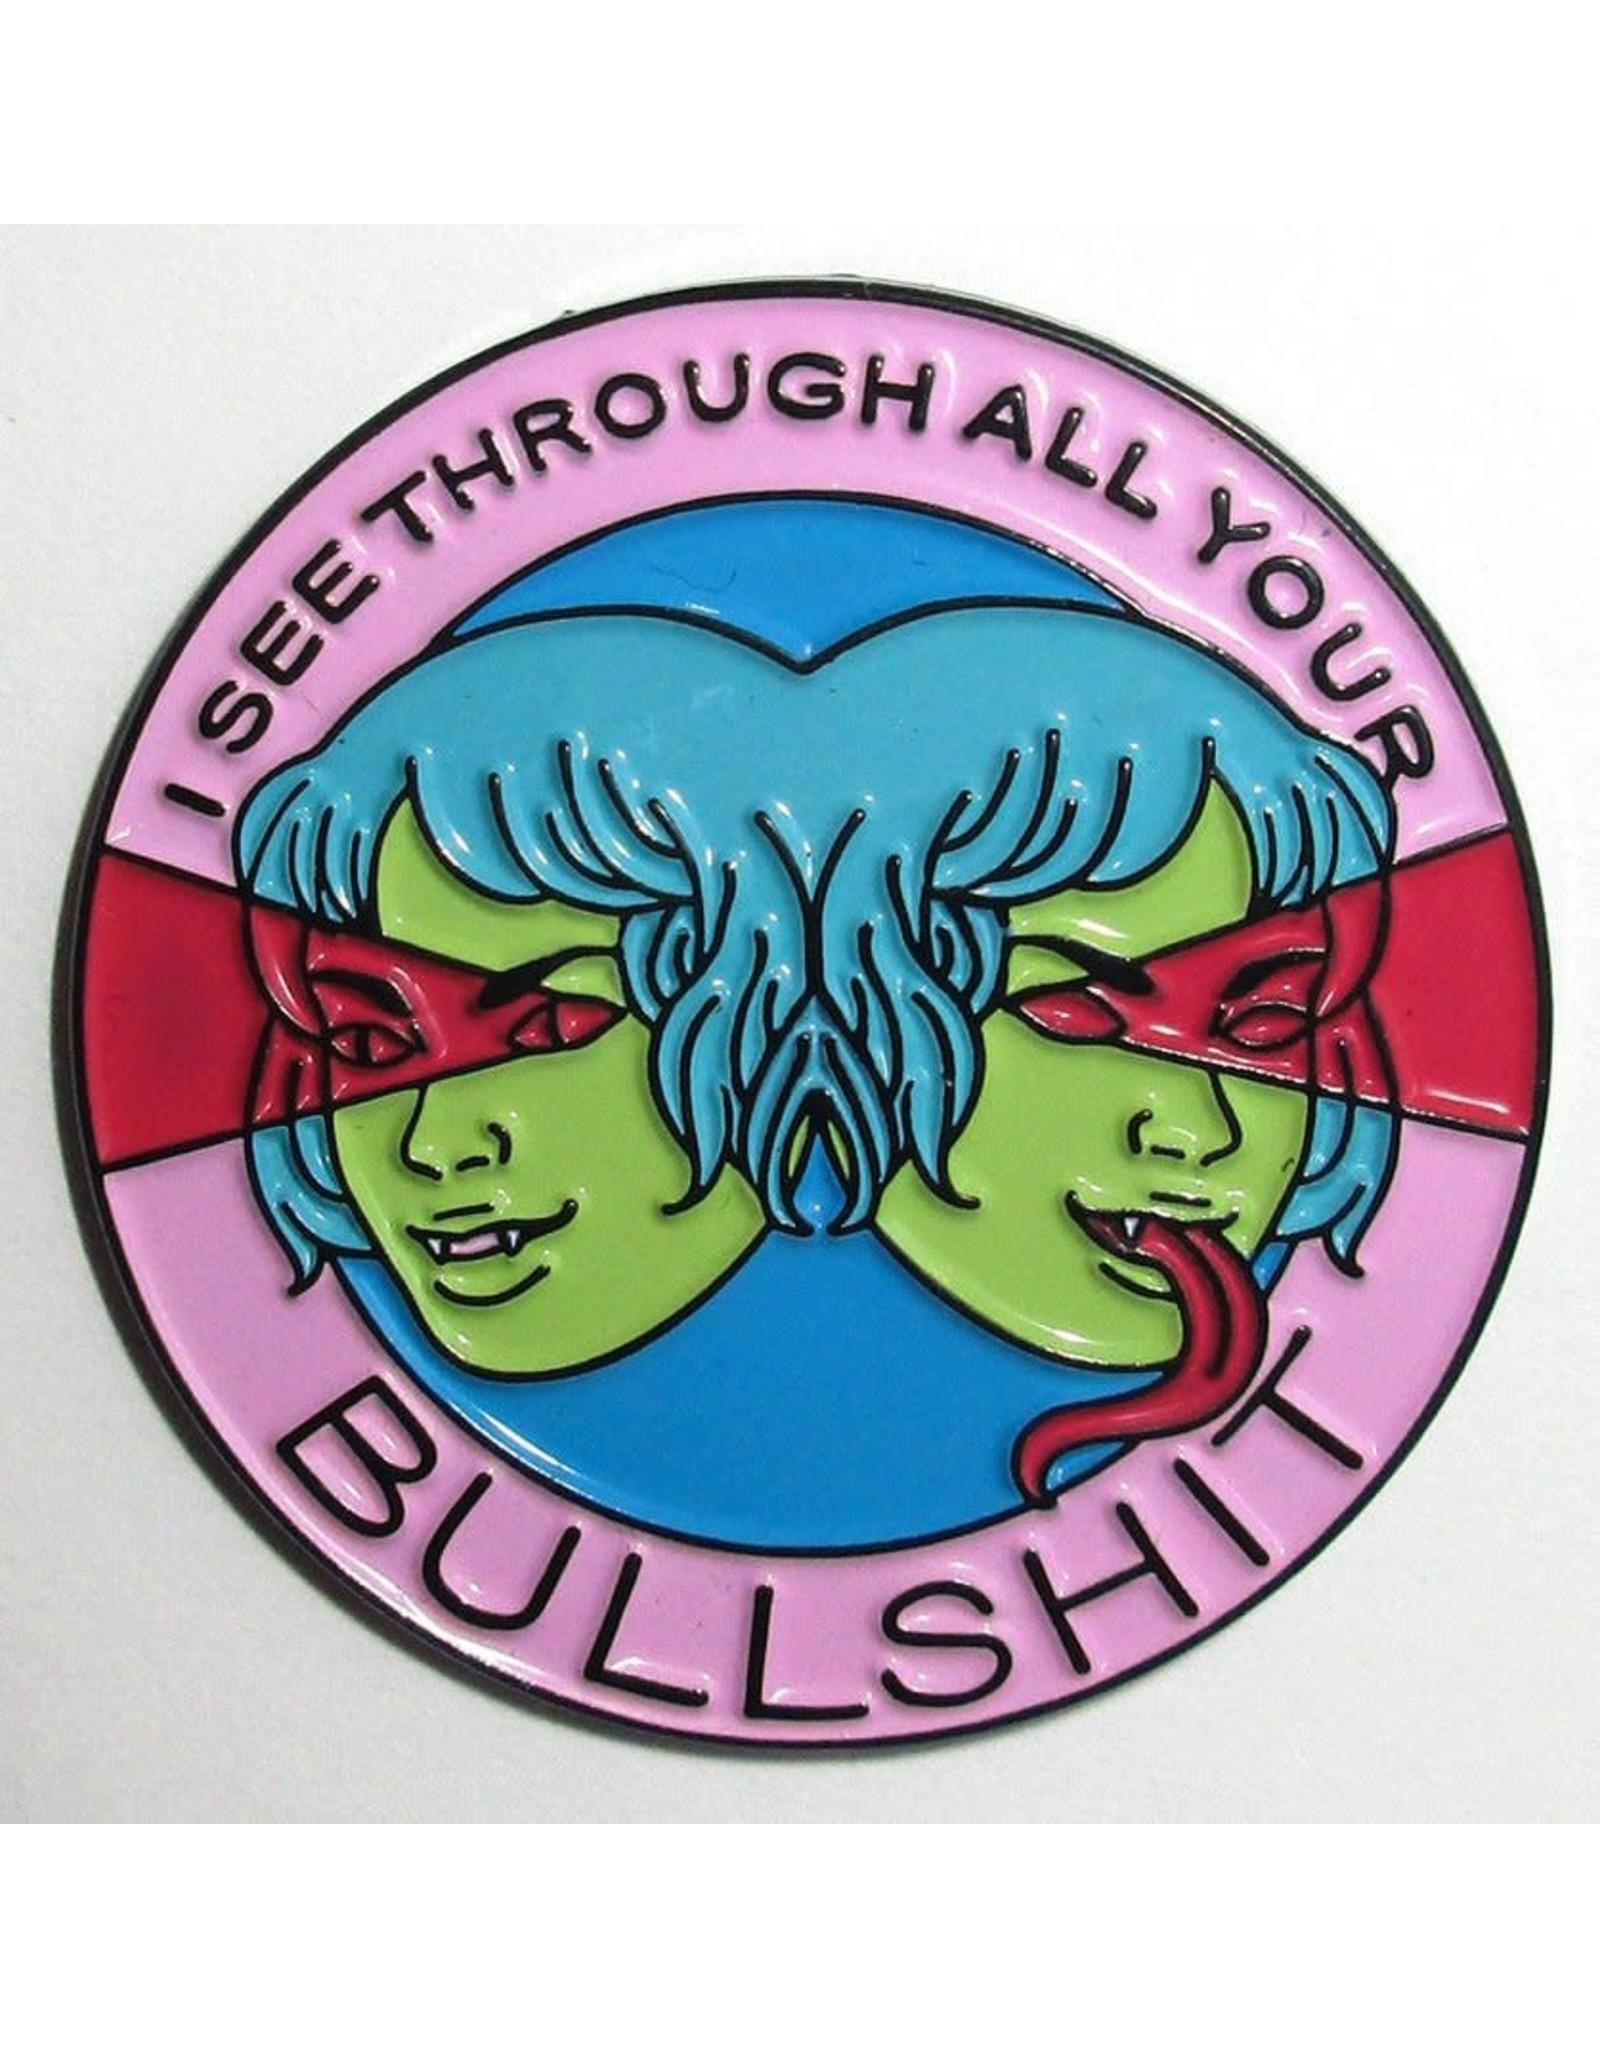 Enamel Pin I See Through All Your Bullshit Enamel Pin